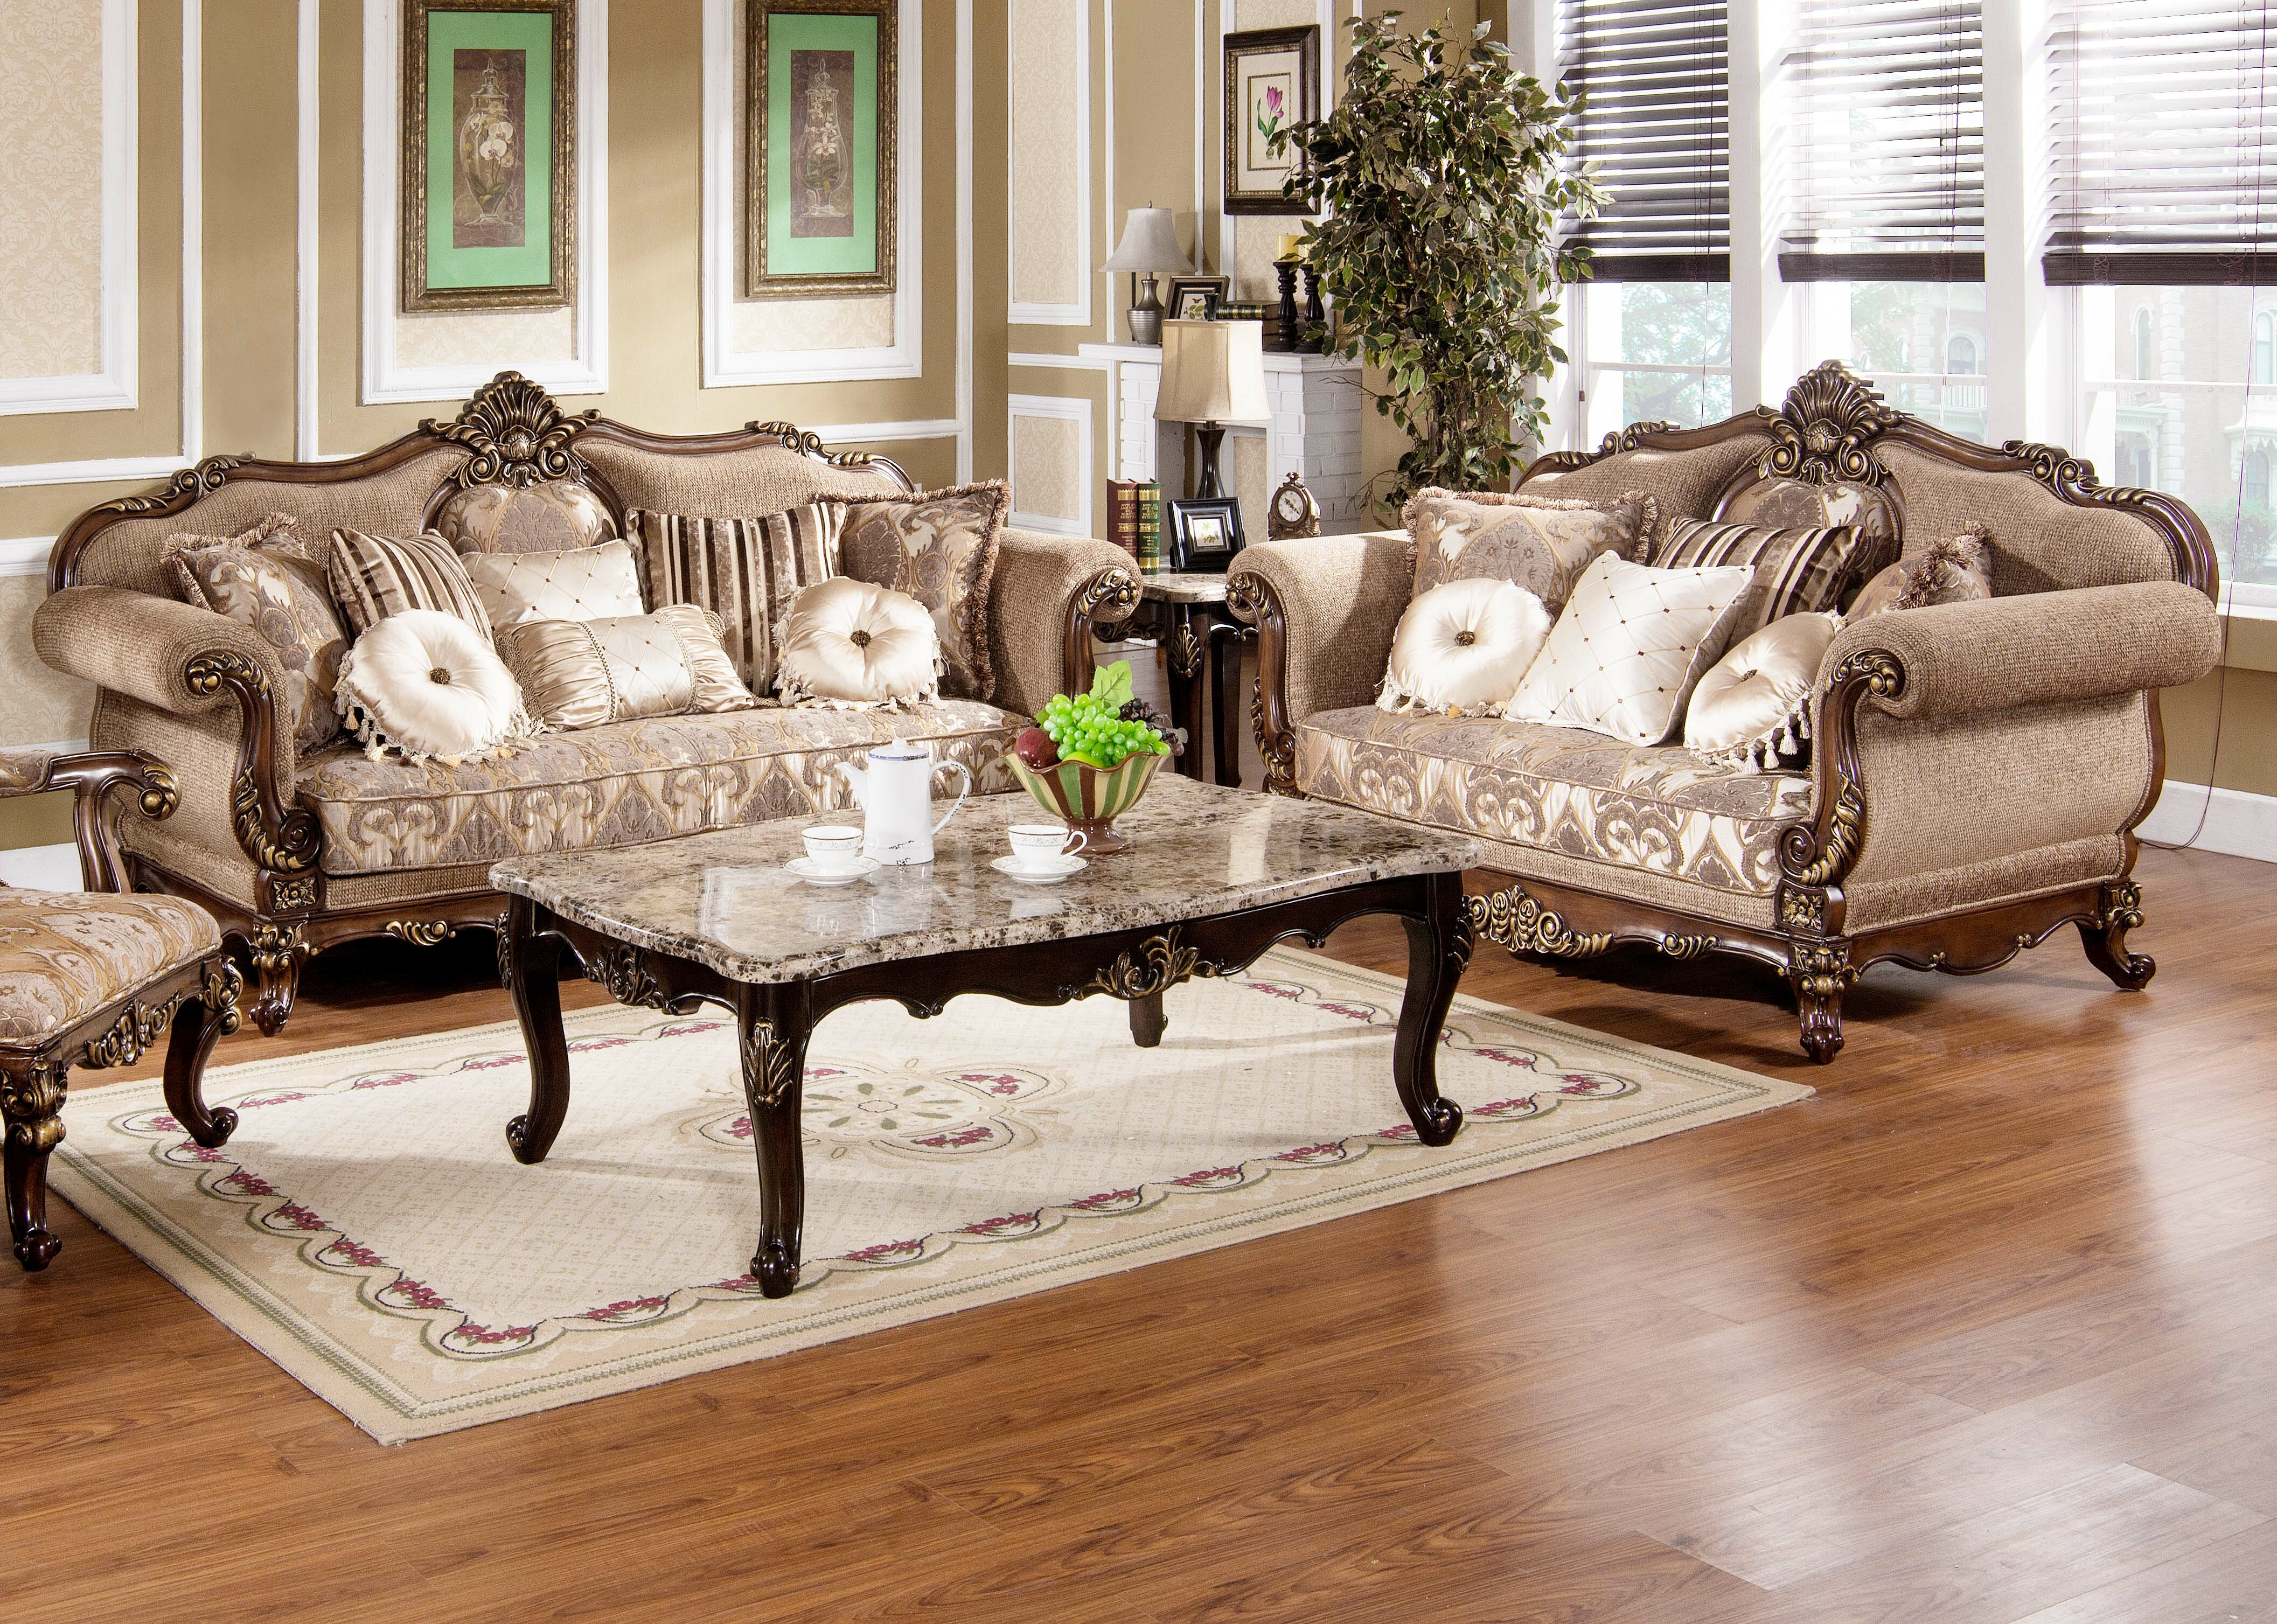 Astoria Grand Living Room Sets You\'ll Love in 2019 | Wayfair